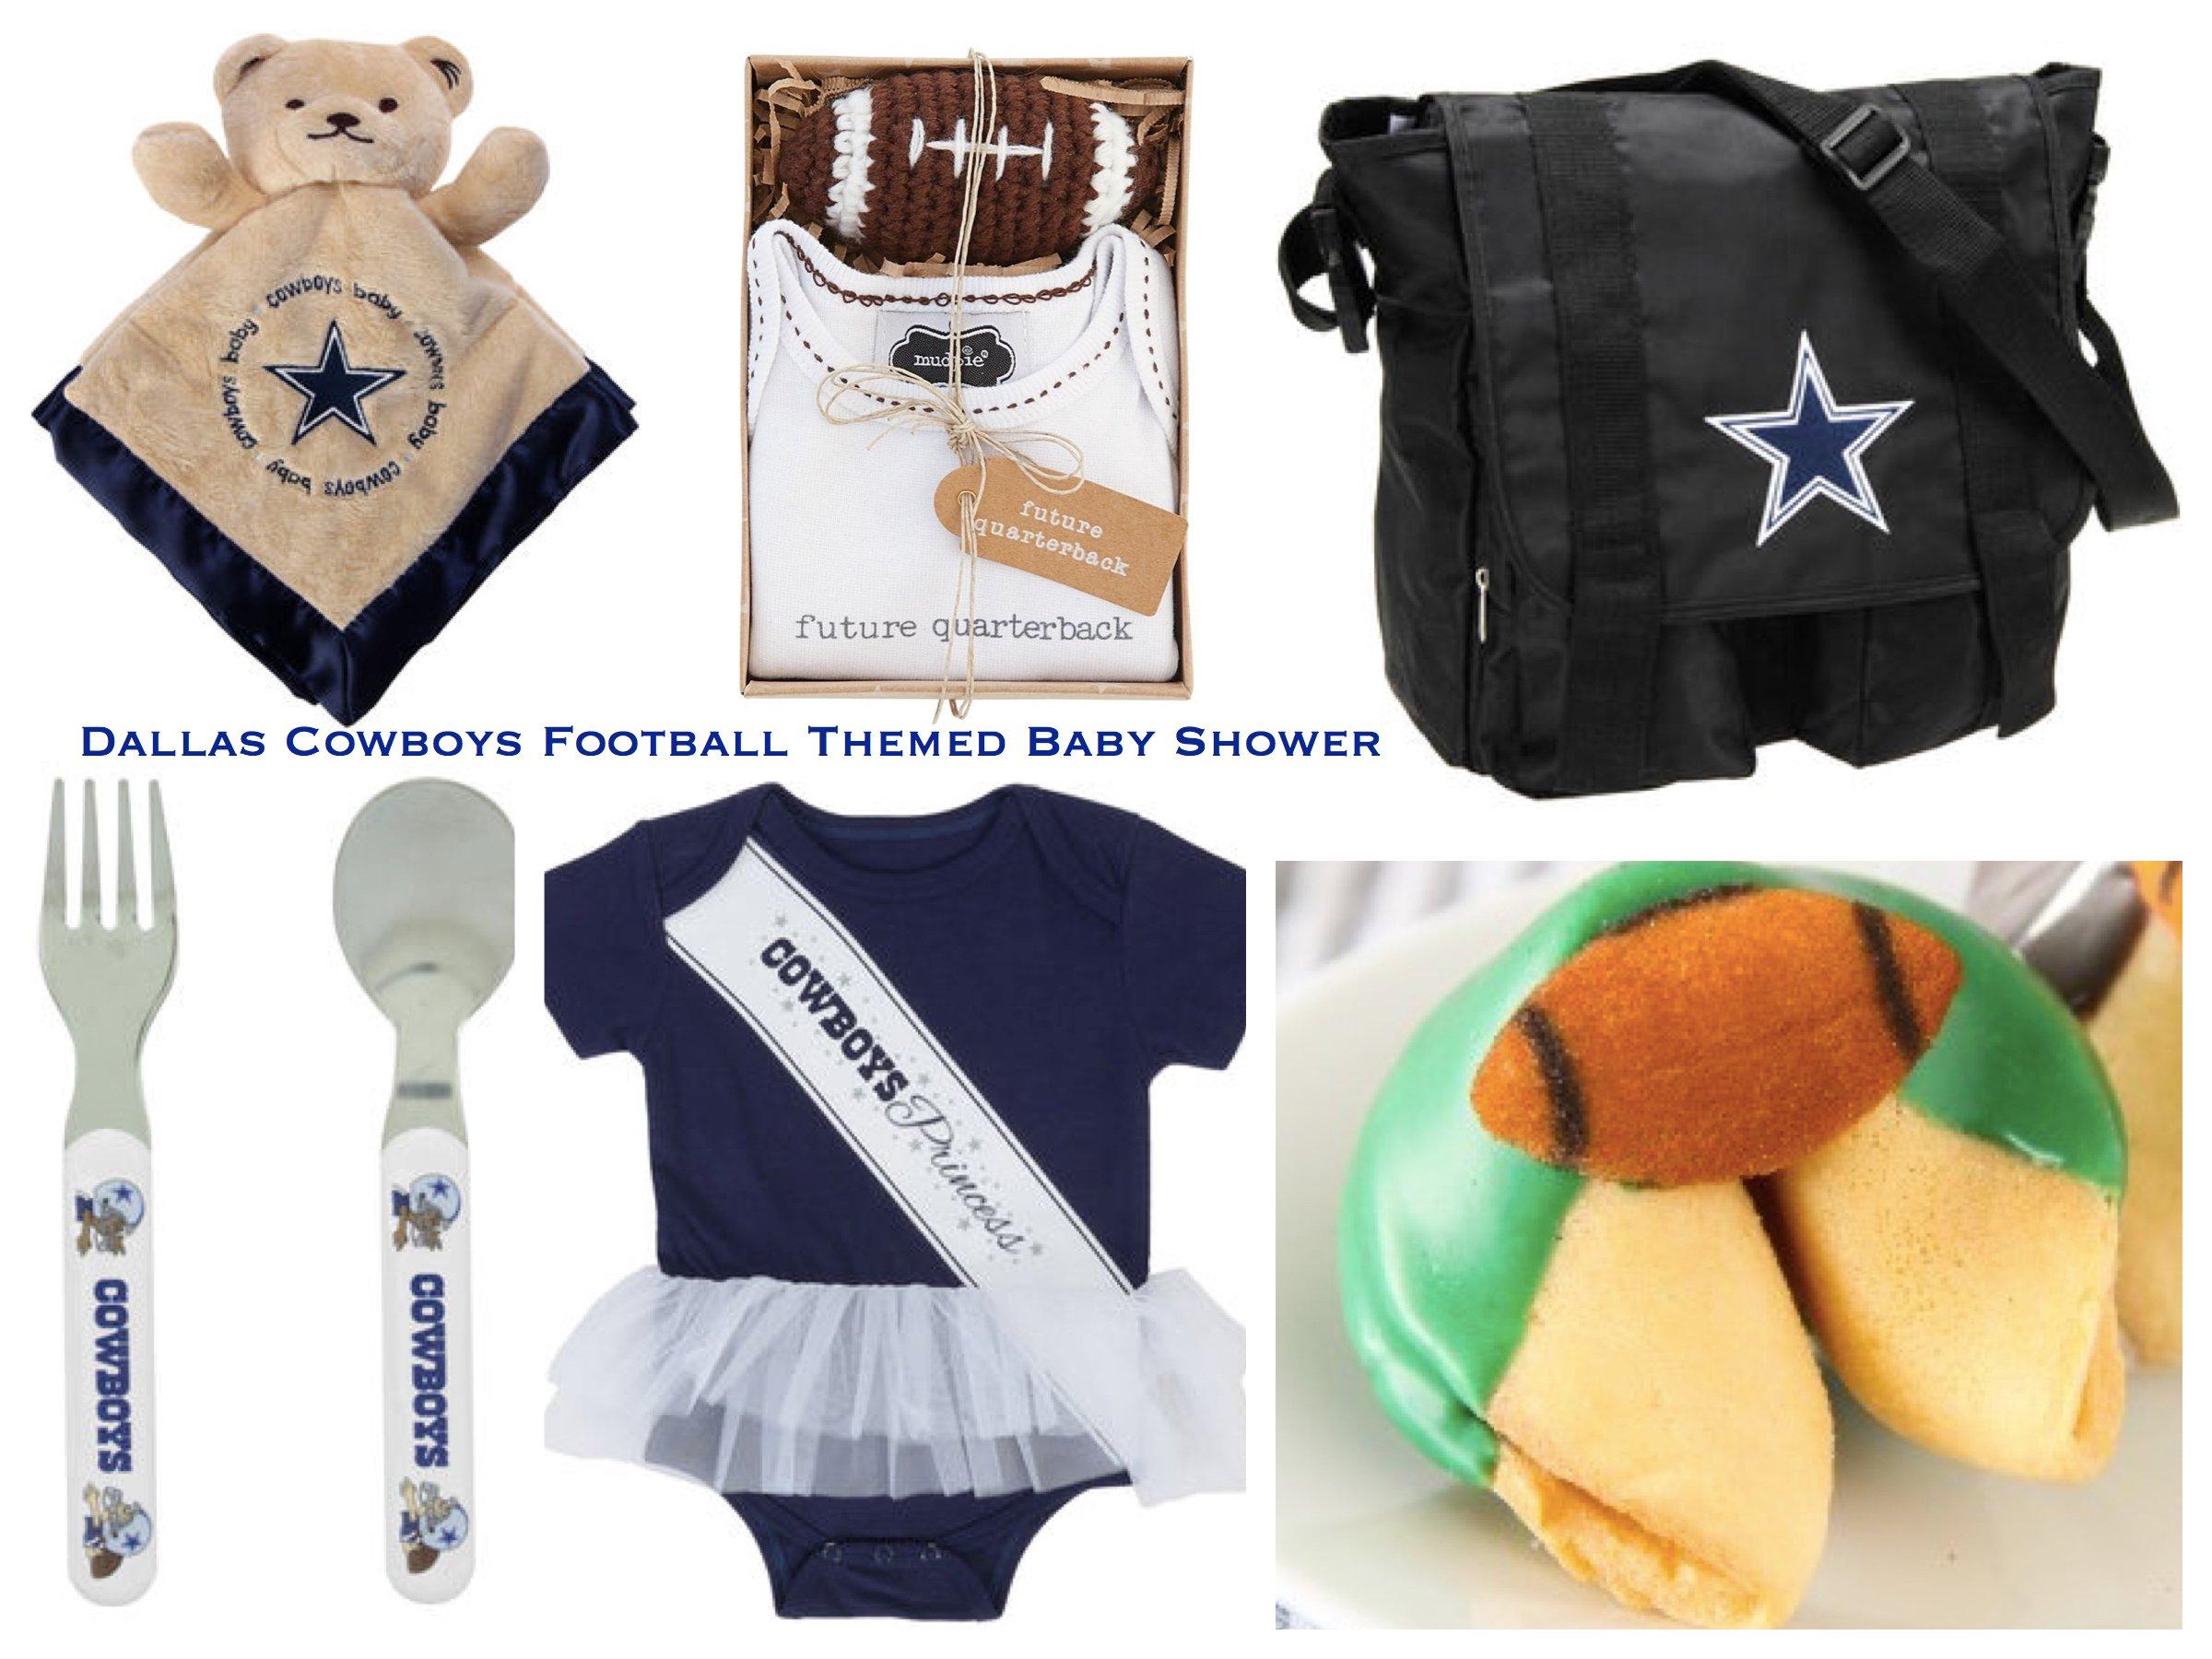 Dallas Cowboys Football Themed Football Baby Shower